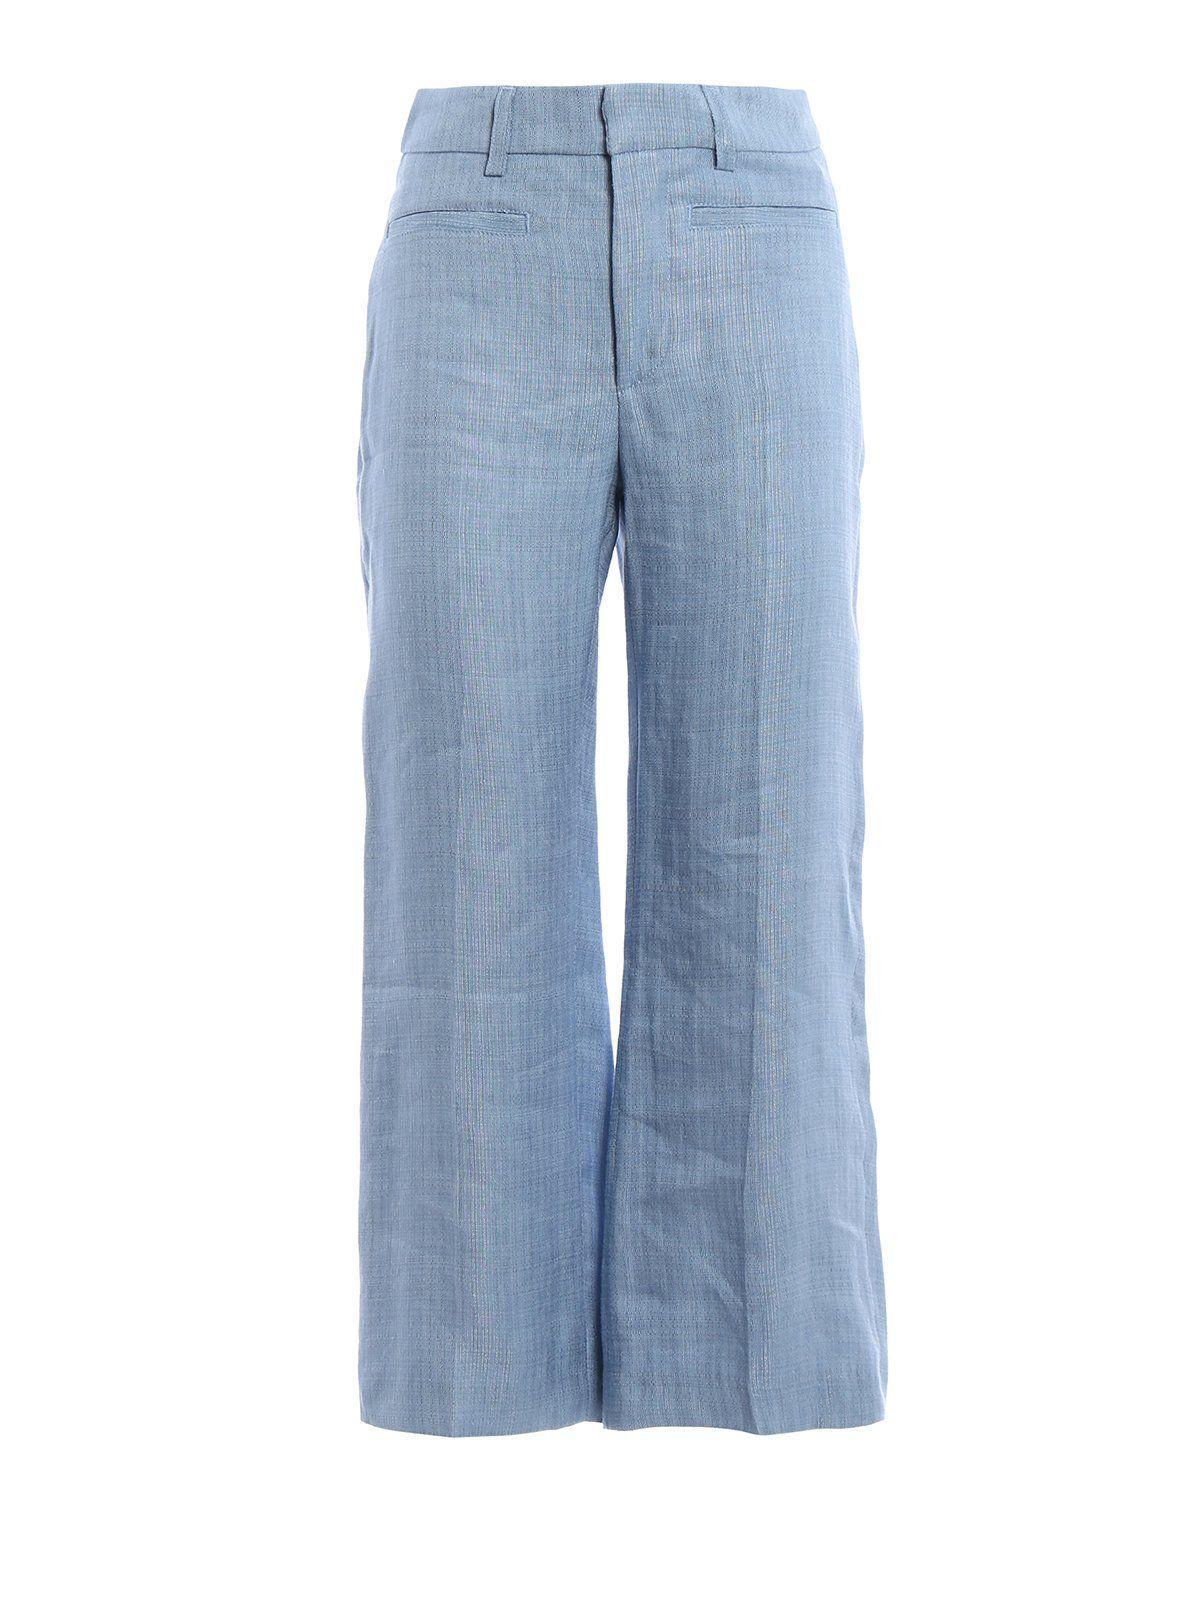 Dondup Romy Wide Leg Jeans In Blue